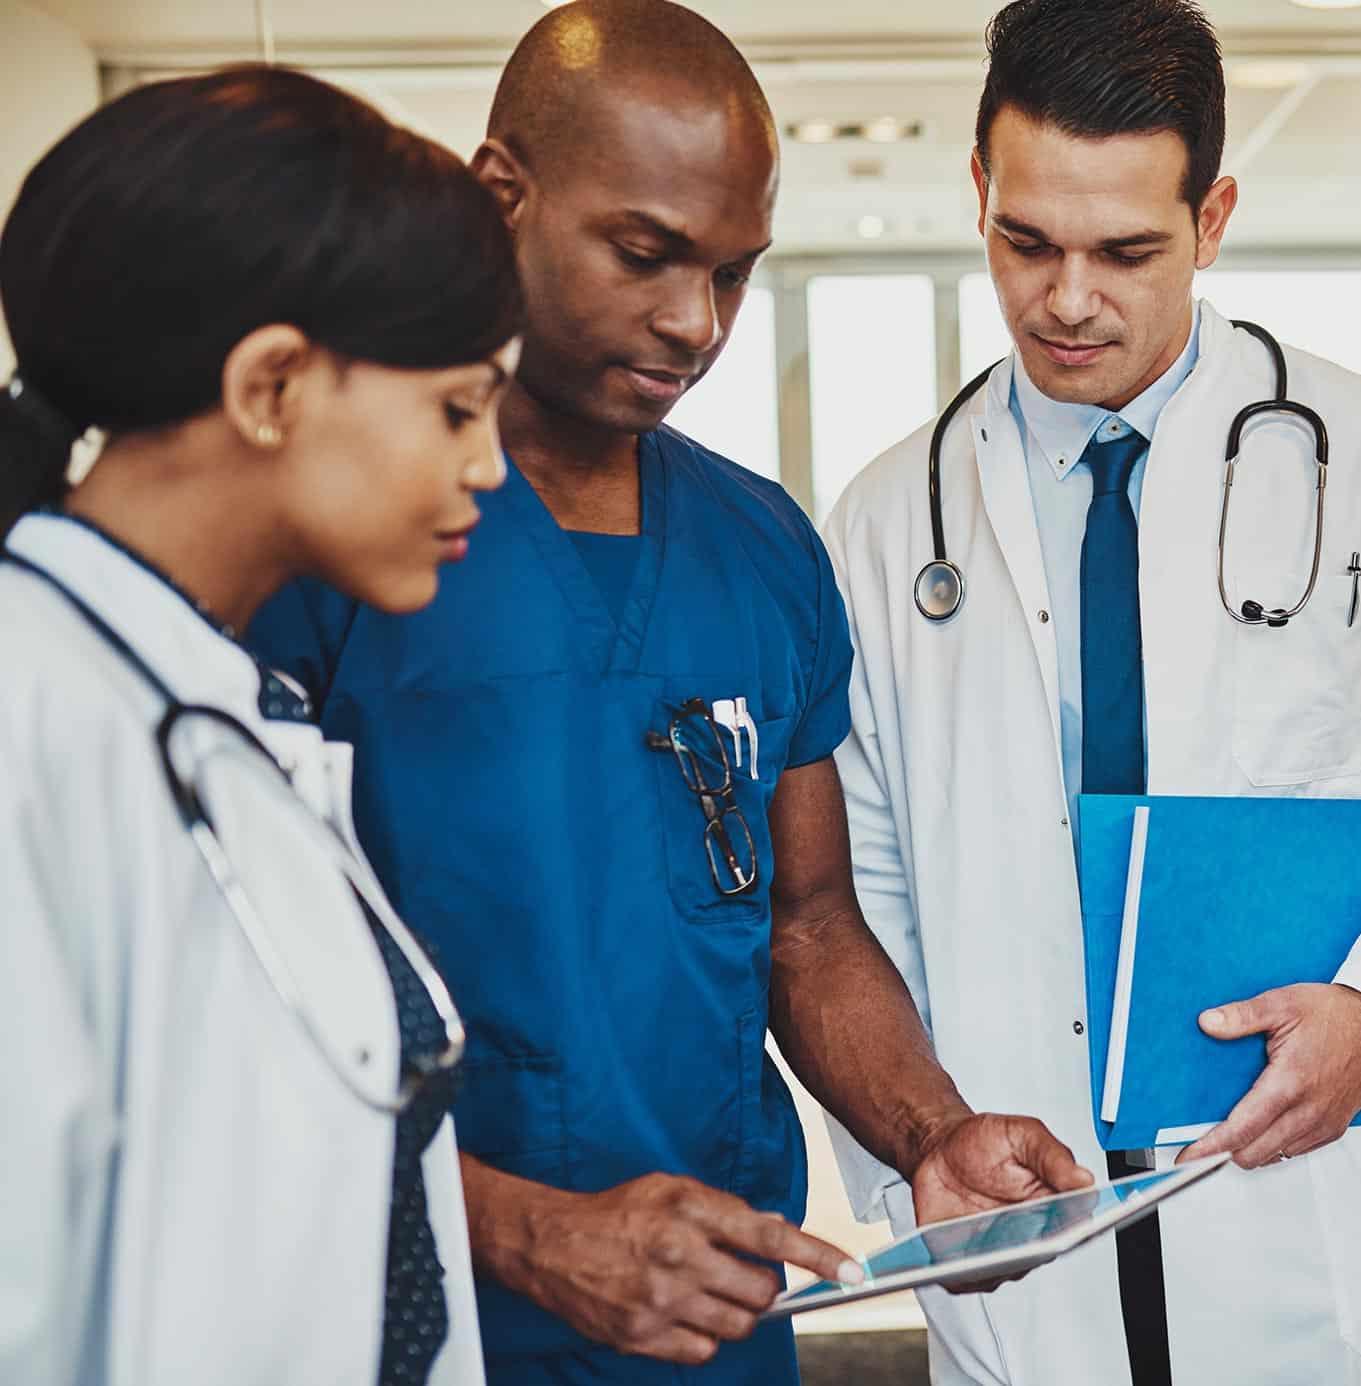 Empowering Care Teams